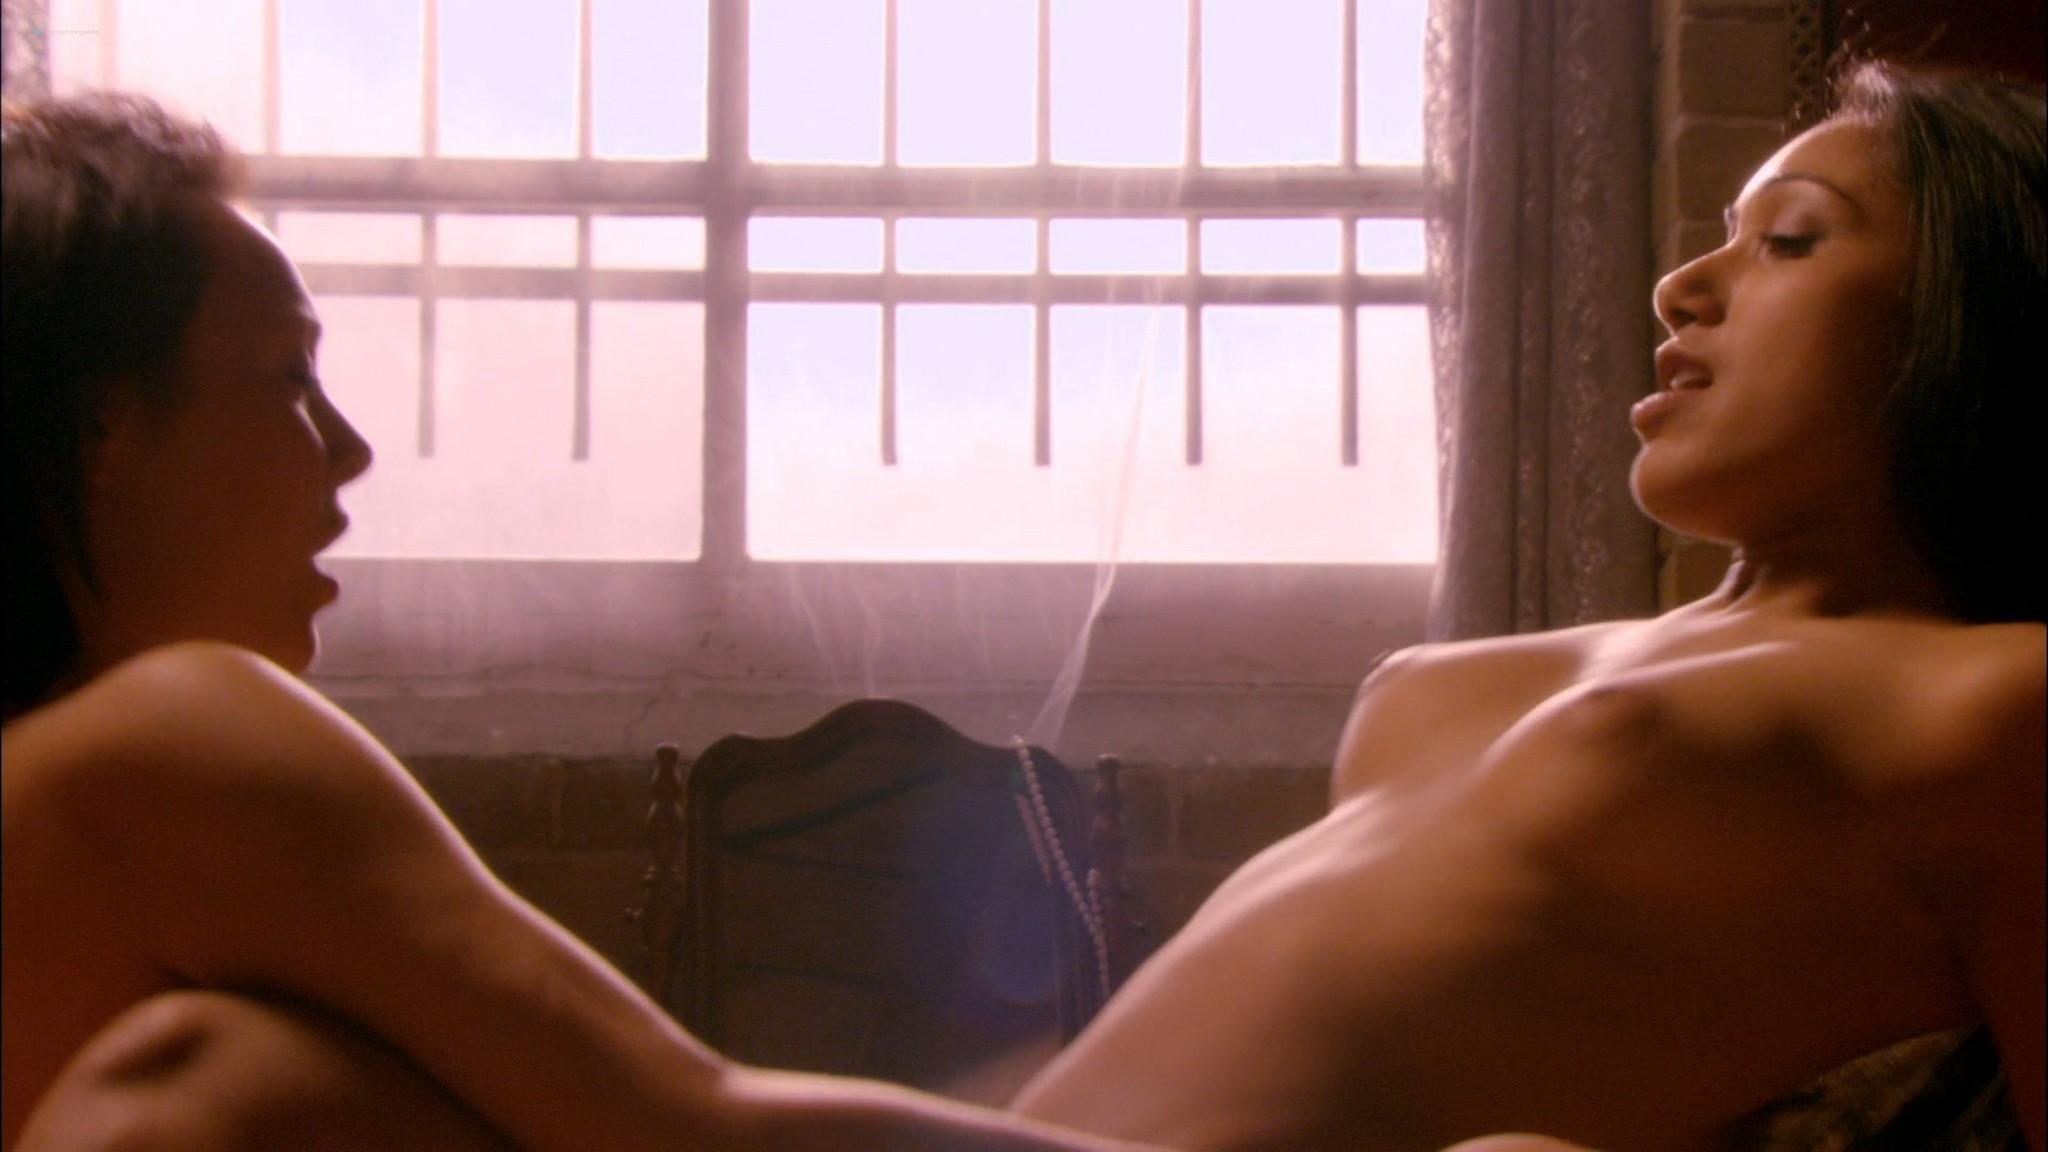 Lana Tailor nude sex Albina Nahar Denise Cobar nude sex Lingerie 2010 HD 1080p 007